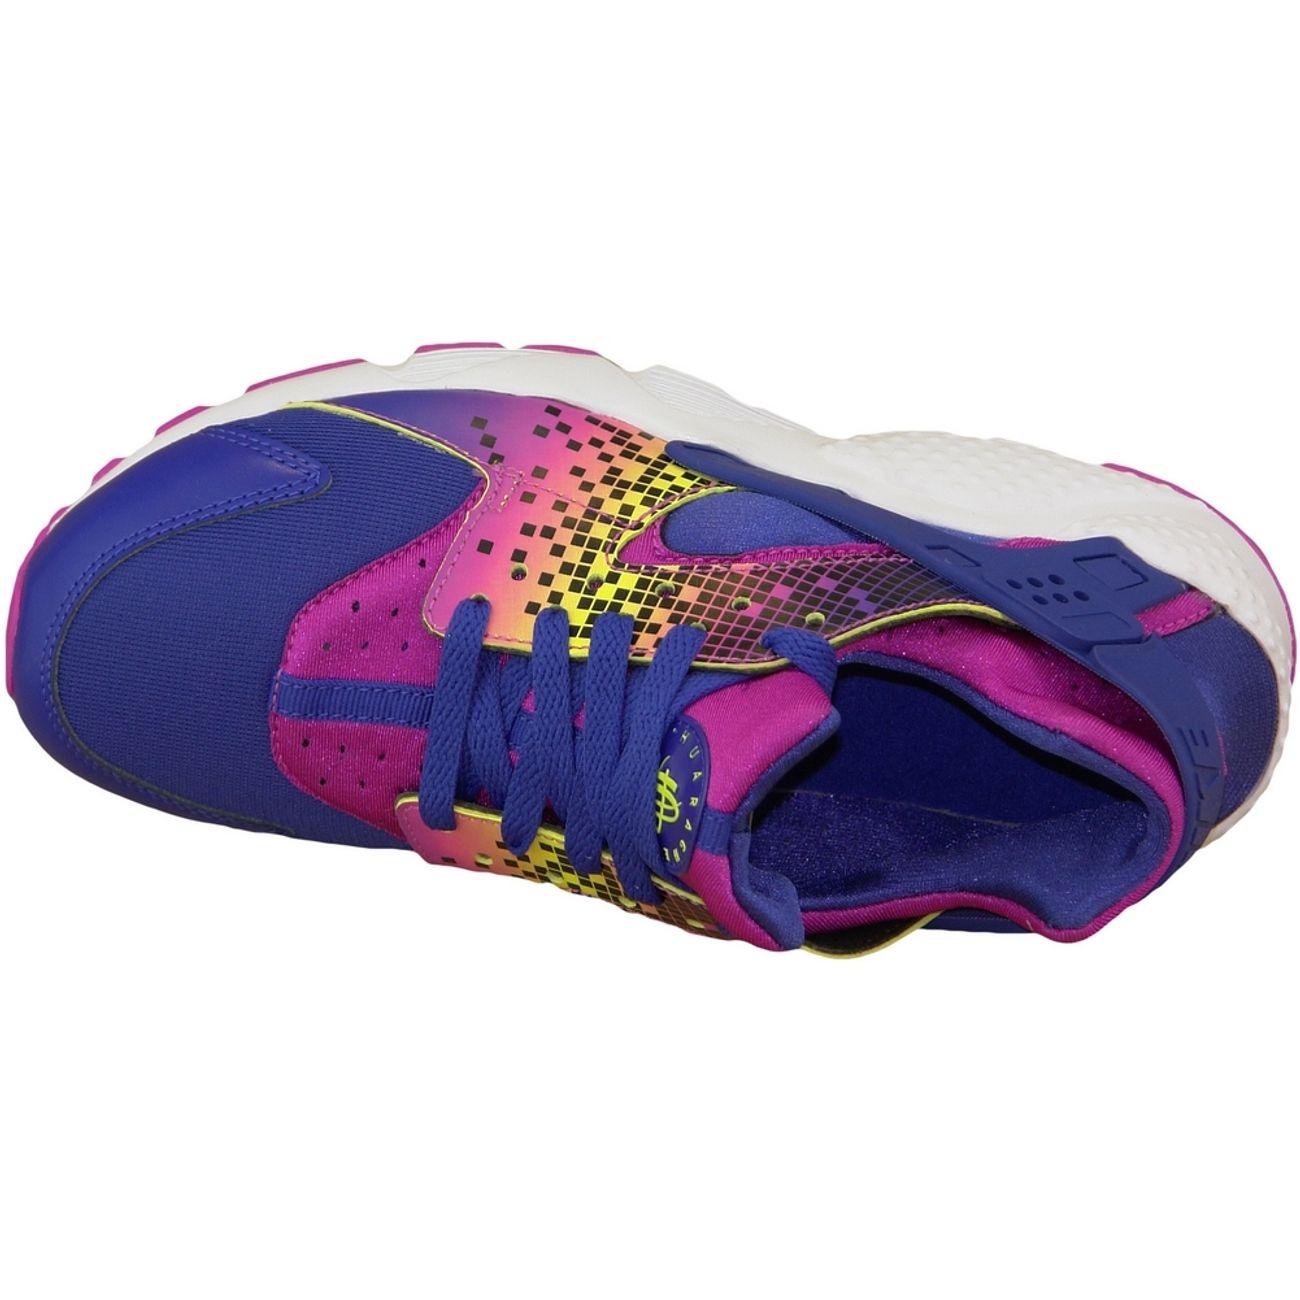 Mode- Lifestyle enfant NIKE Nike Huarache Run Print Gs  704946-500